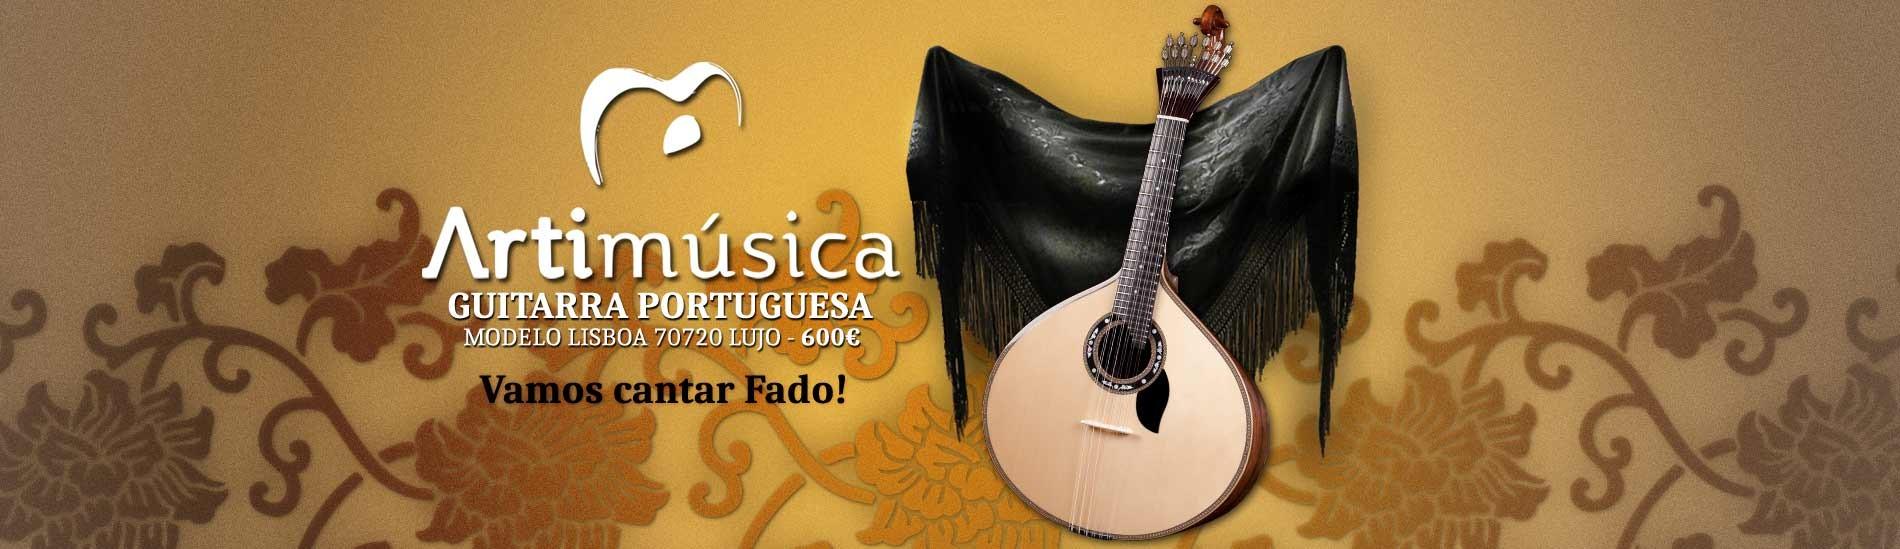 Guitarra Portuguesa Lisboa Artimúsica 70720 Lujo